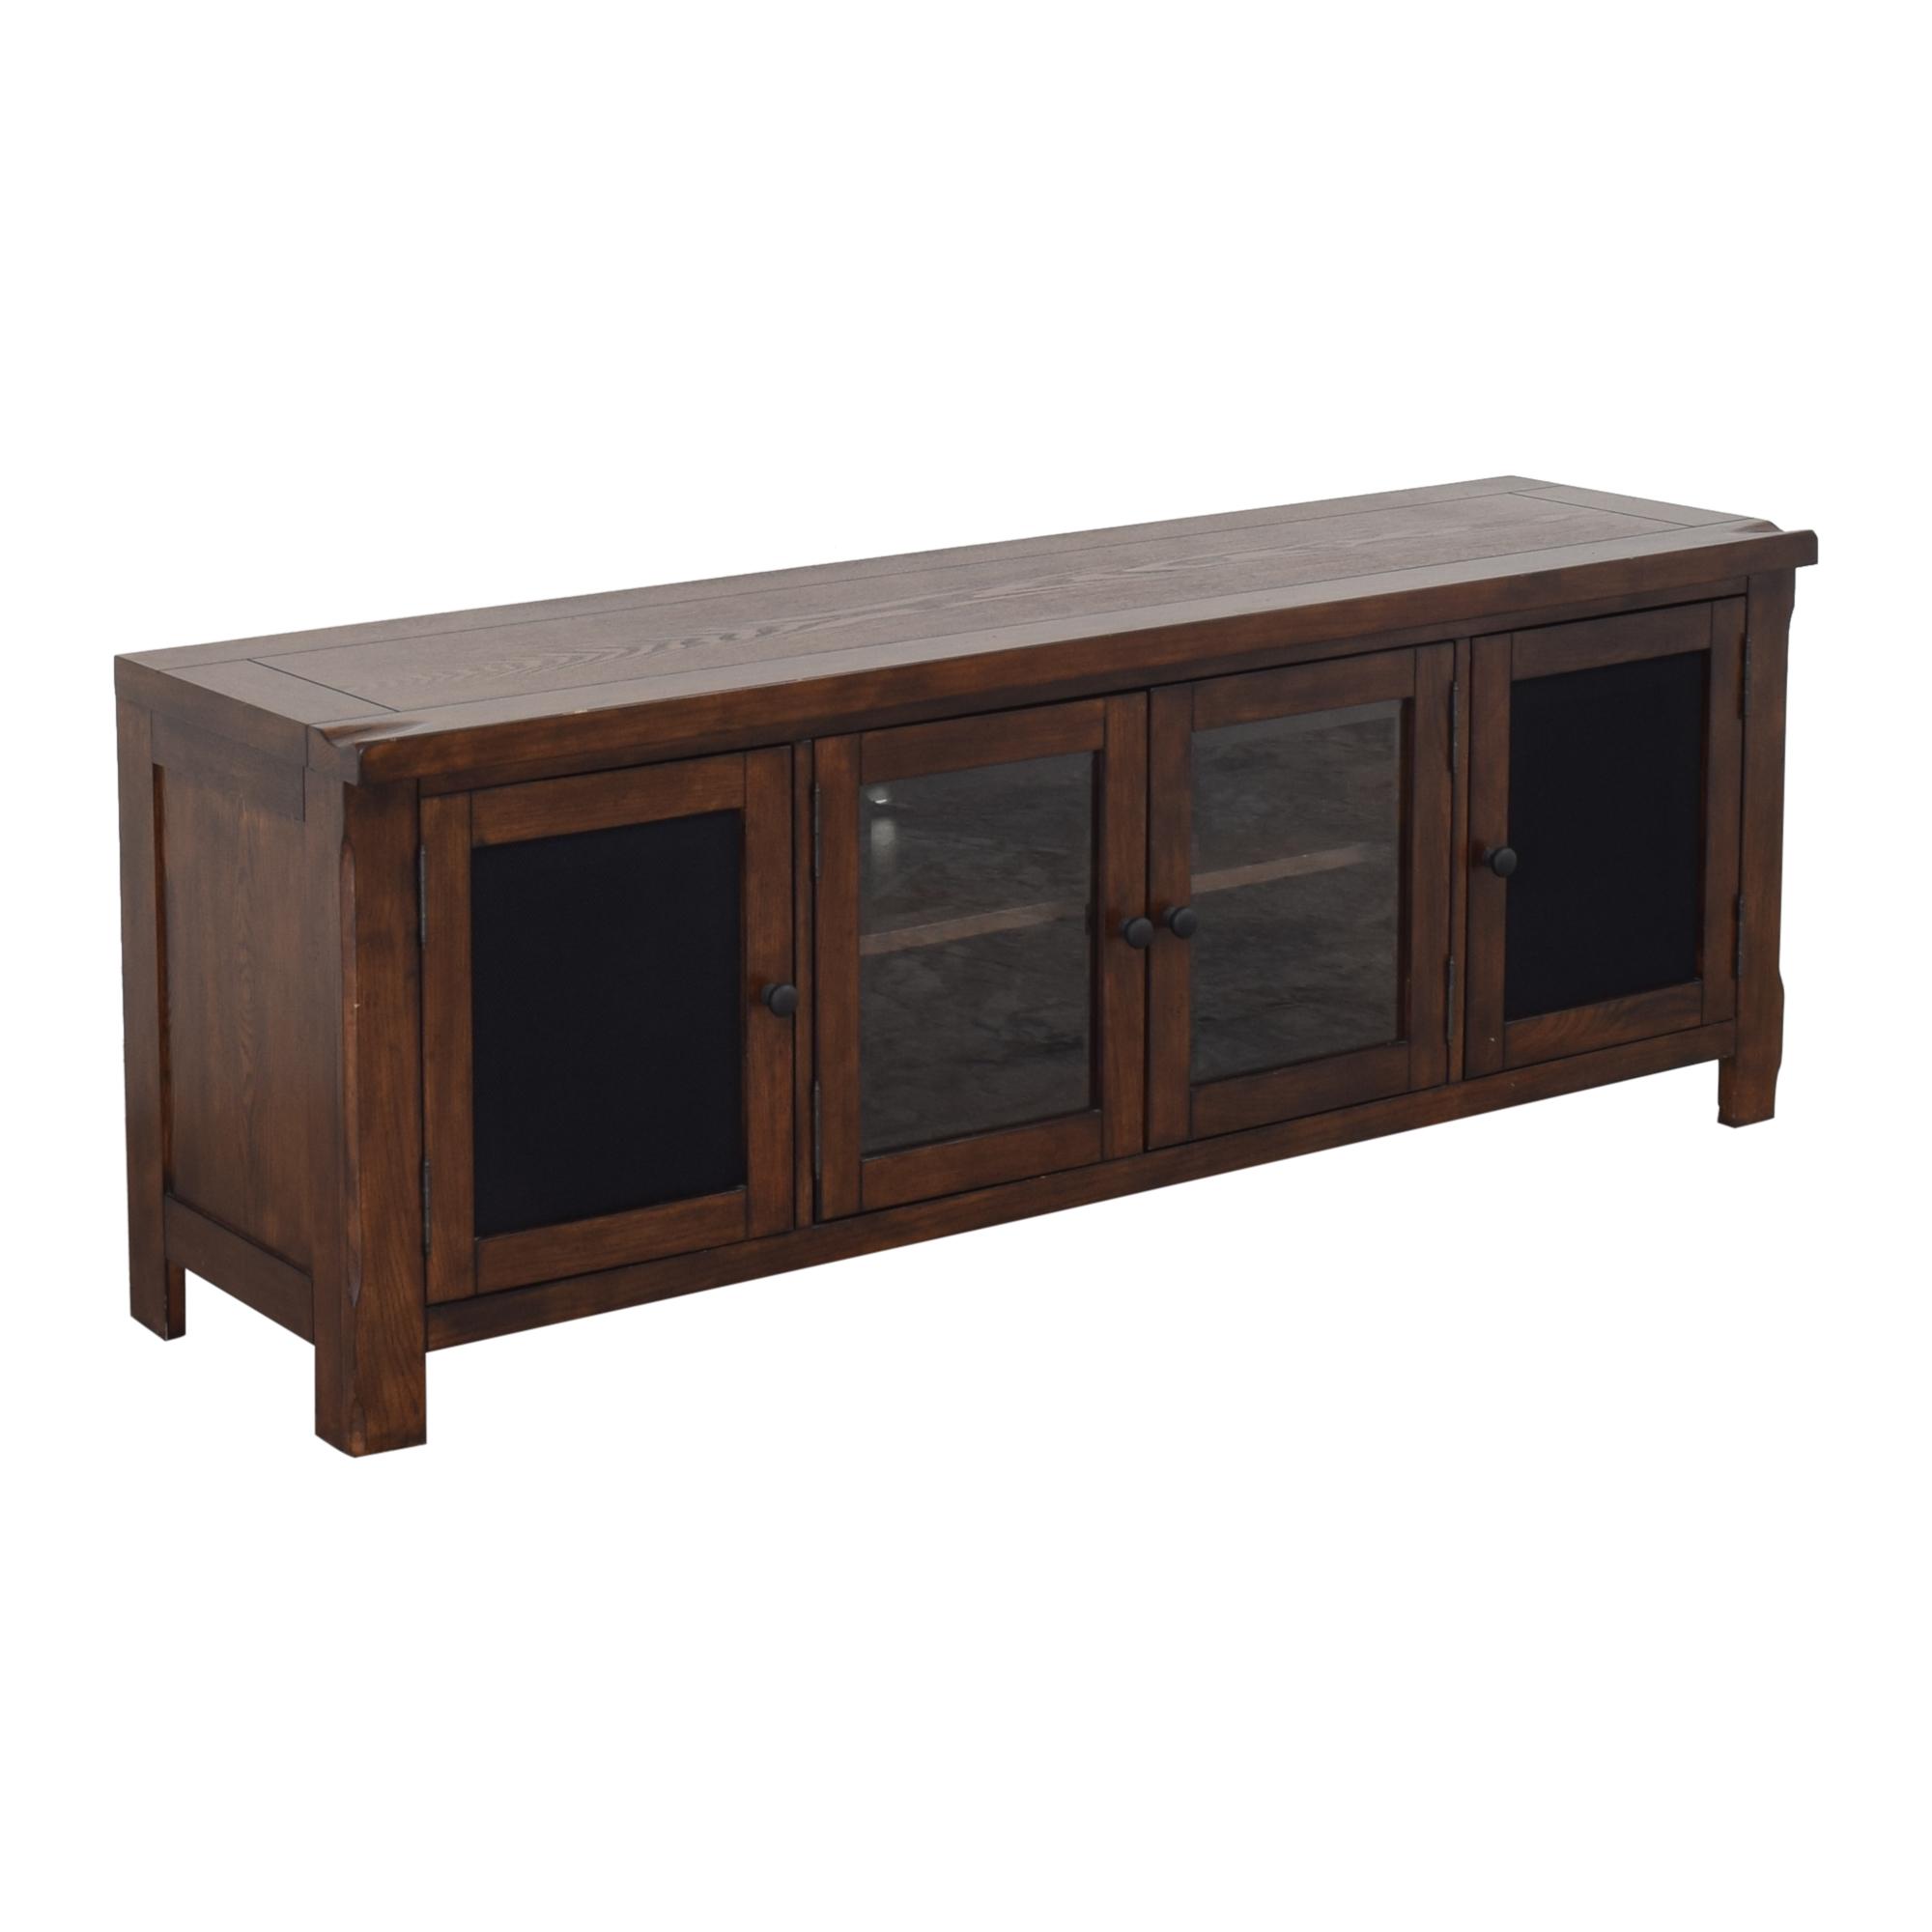 Emerald Home Furnishings Pampa Furniture Media Center Media Units